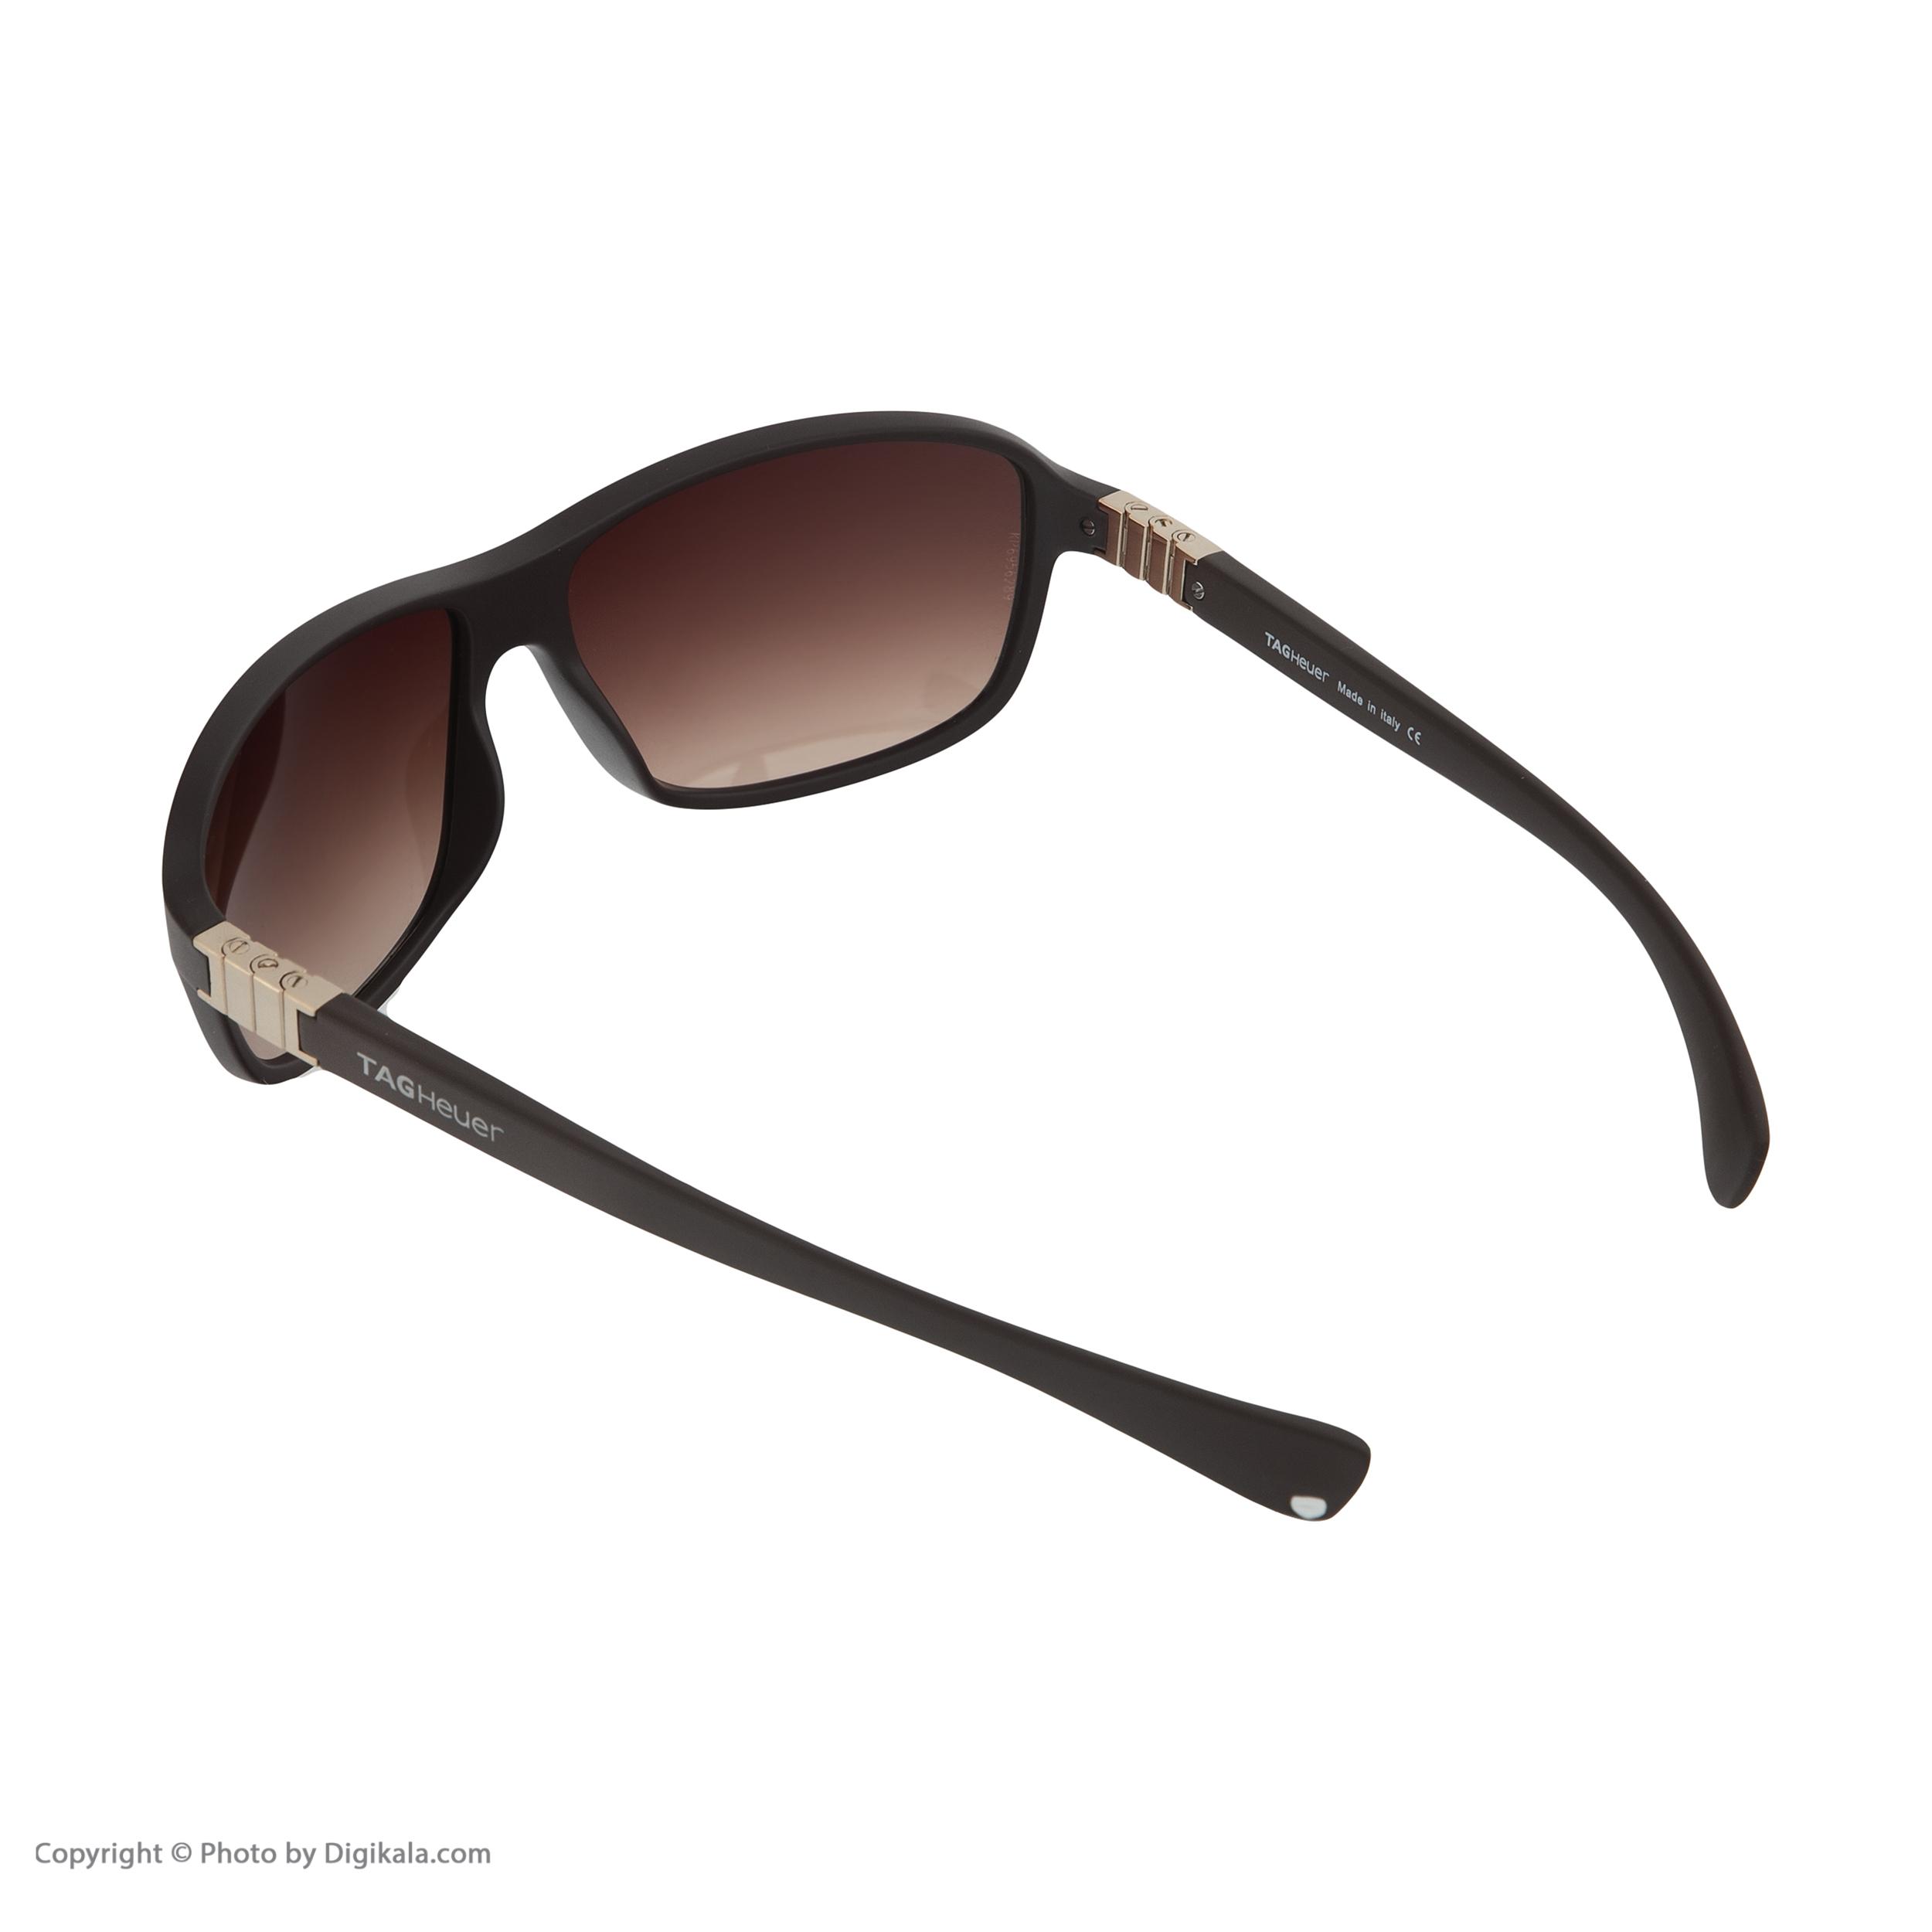 عینک آفتابی تگ هویر مدل 9302 -  - 4